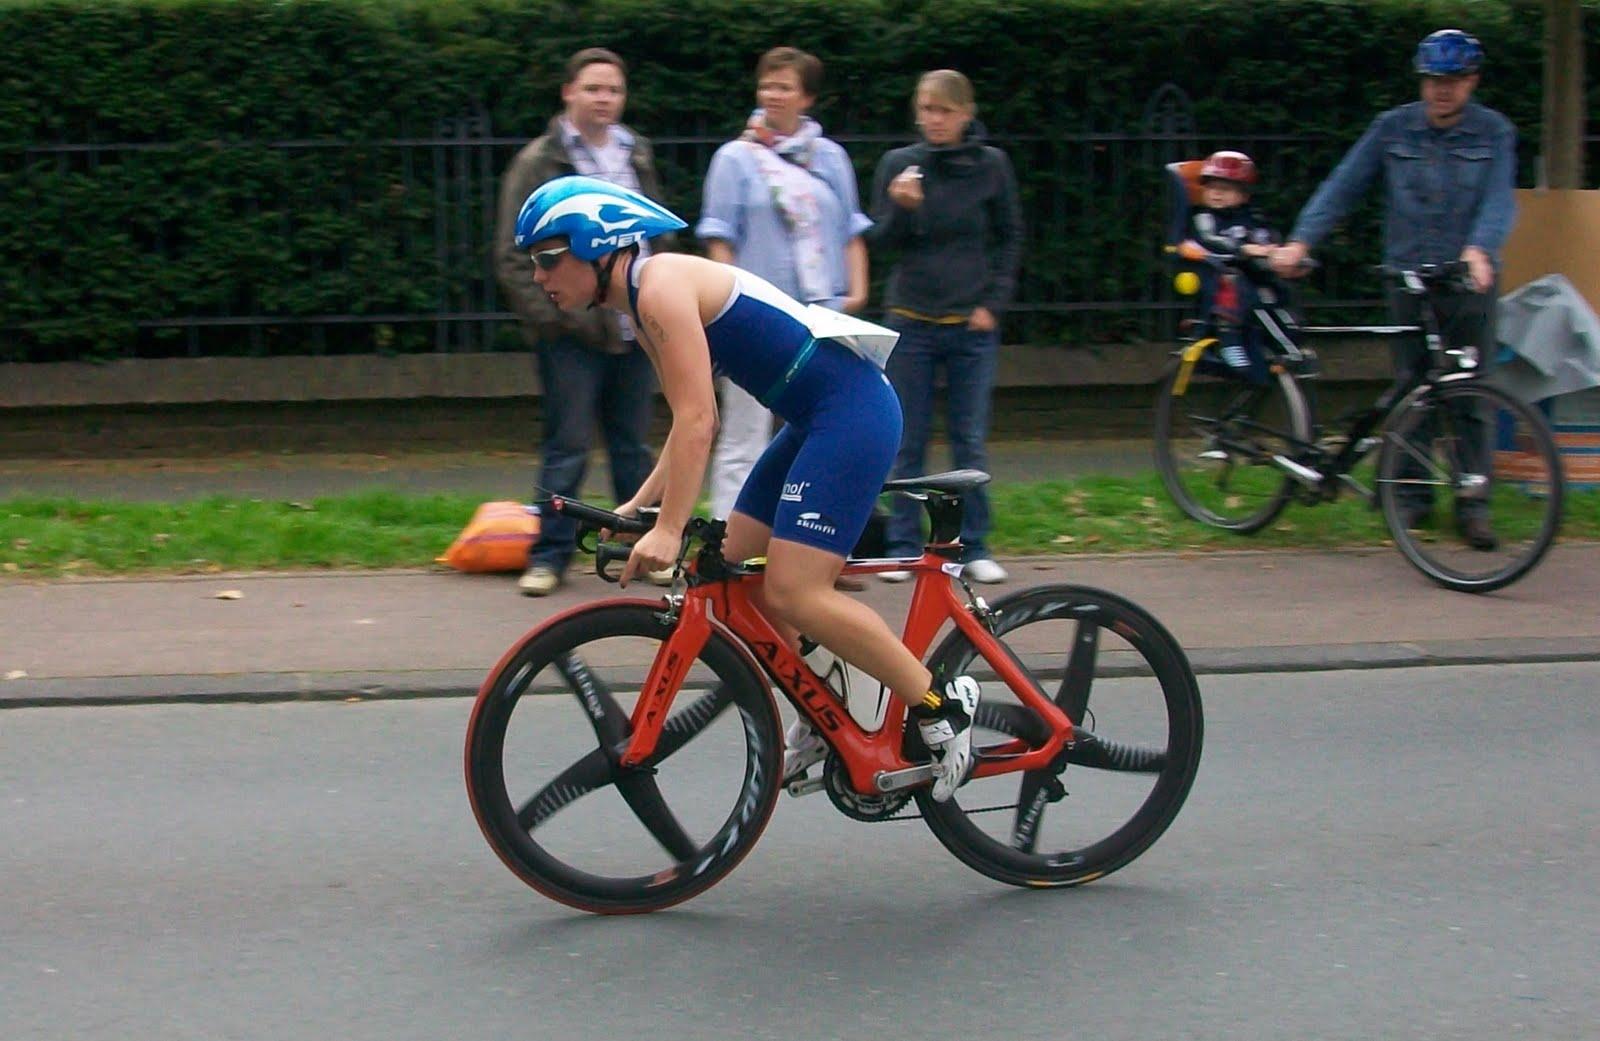 Inge Roersch Christian Kock Ratingen Triathlon